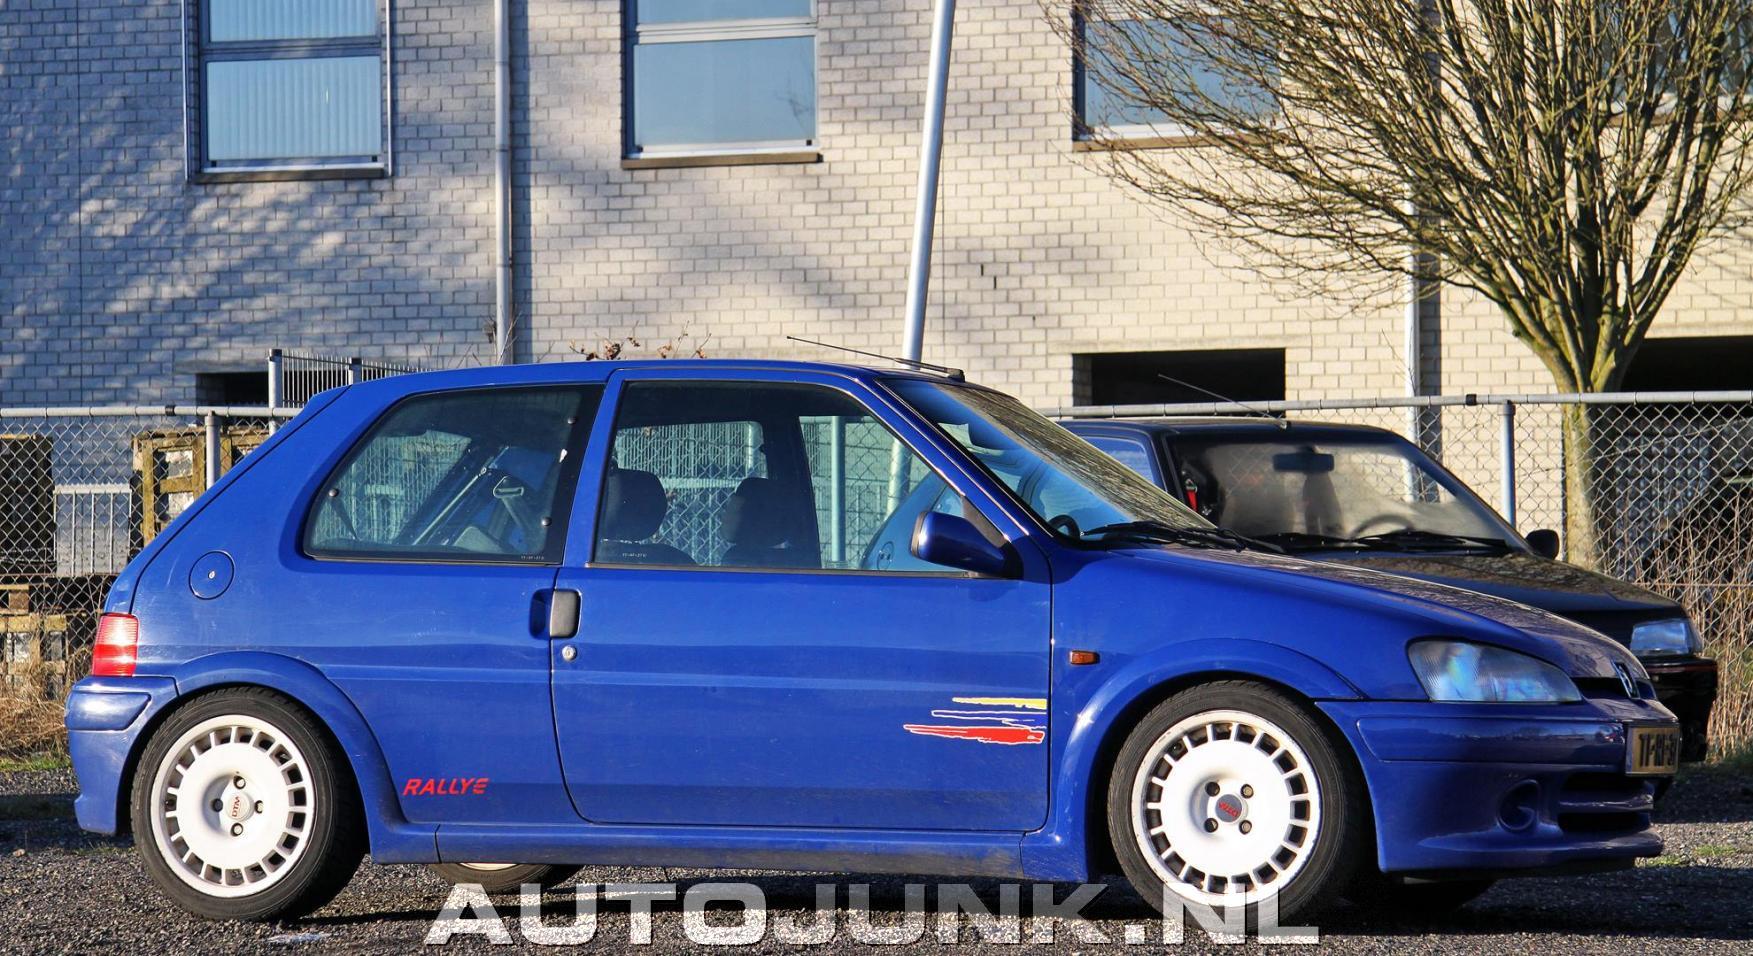 Peugeot 106 Rallye S2 Fotos Autojunknl 163282